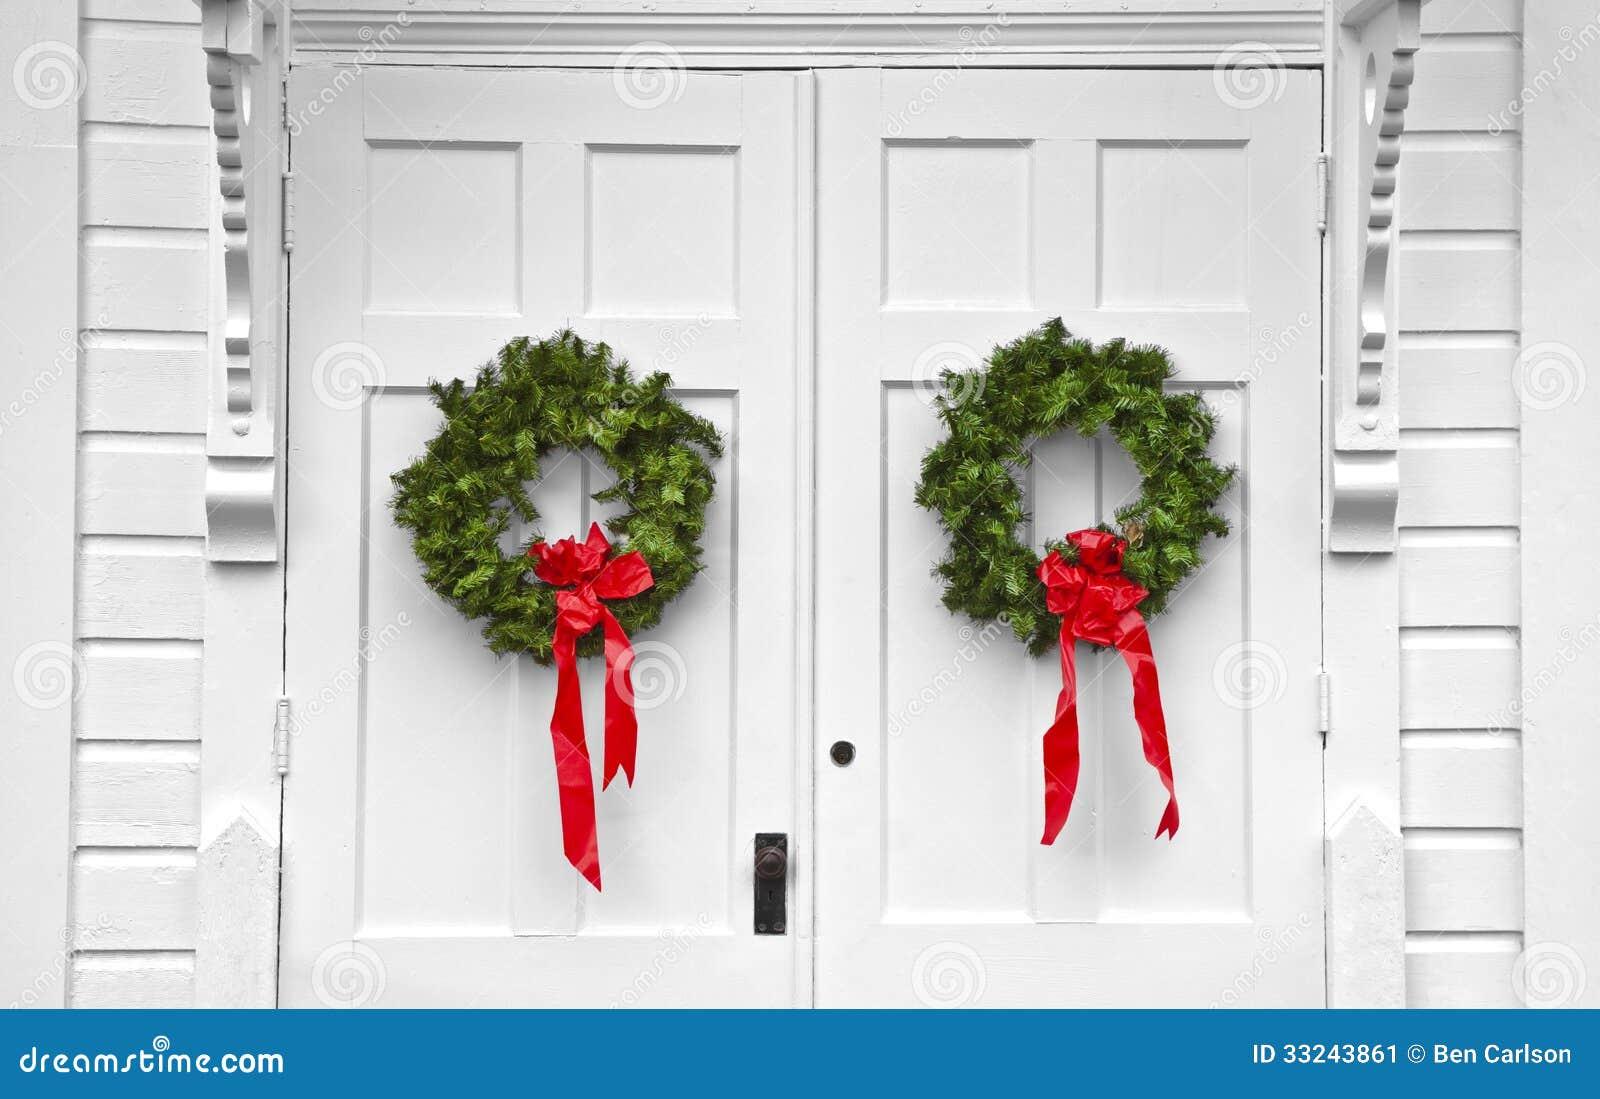 kirchen doppelte t r weihnachtskr nze stockbild bild. Black Bedroom Furniture Sets. Home Design Ideas